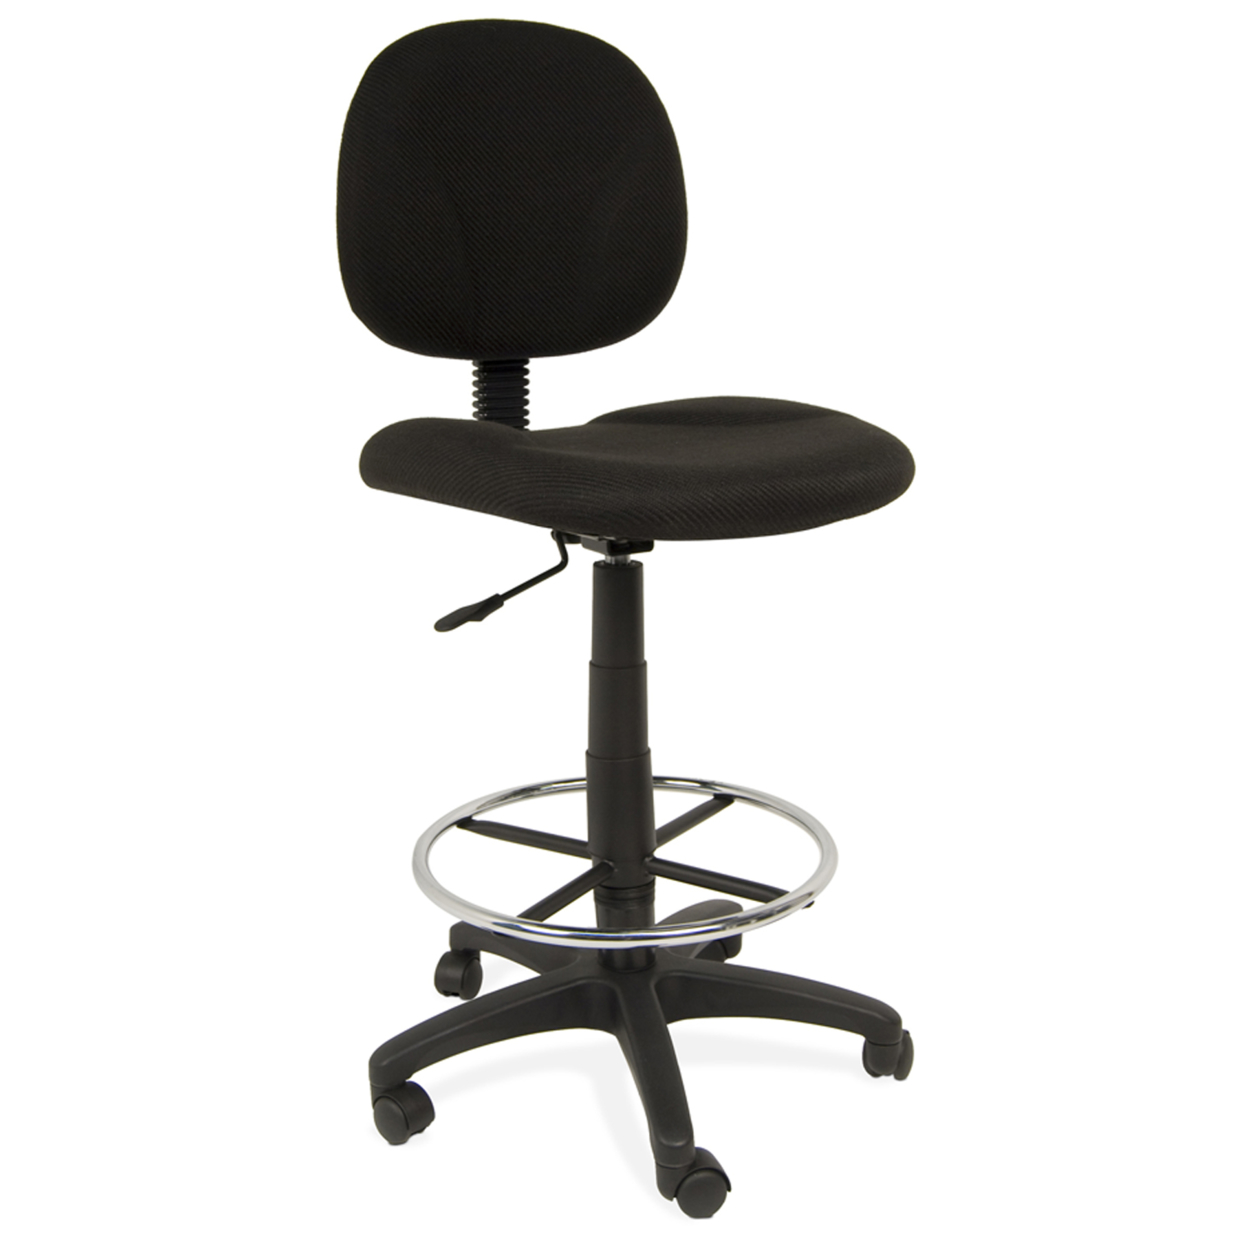 Studio Designs Home Office Ergo Pro Chair - Black studio designs home office maxima ii drafting chair black